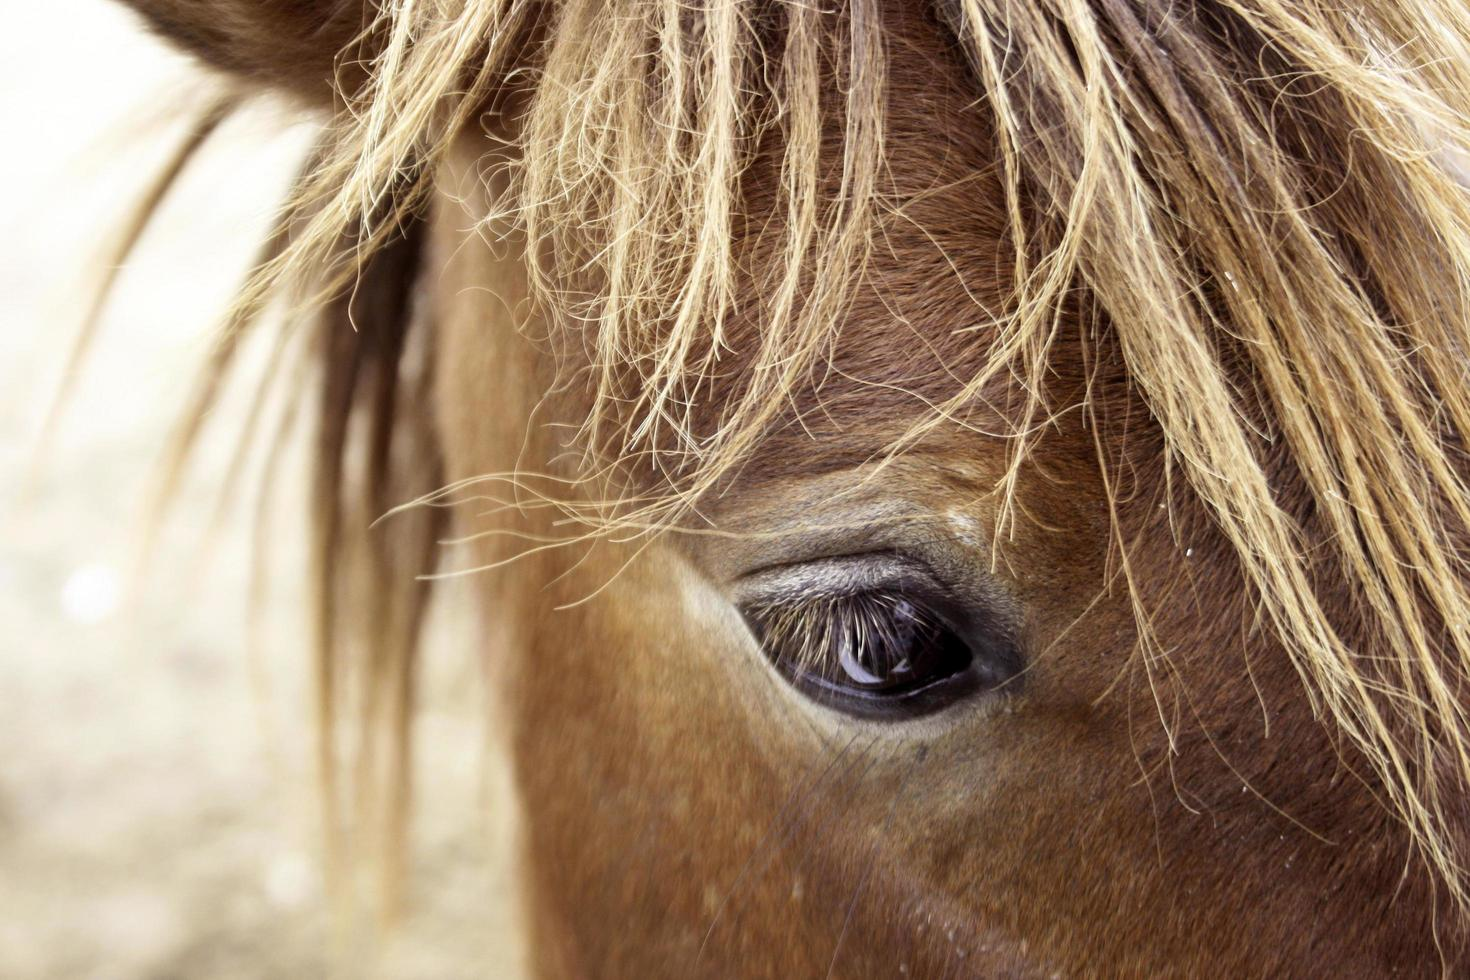 Nahaufnahme eines Pferdeauges foto